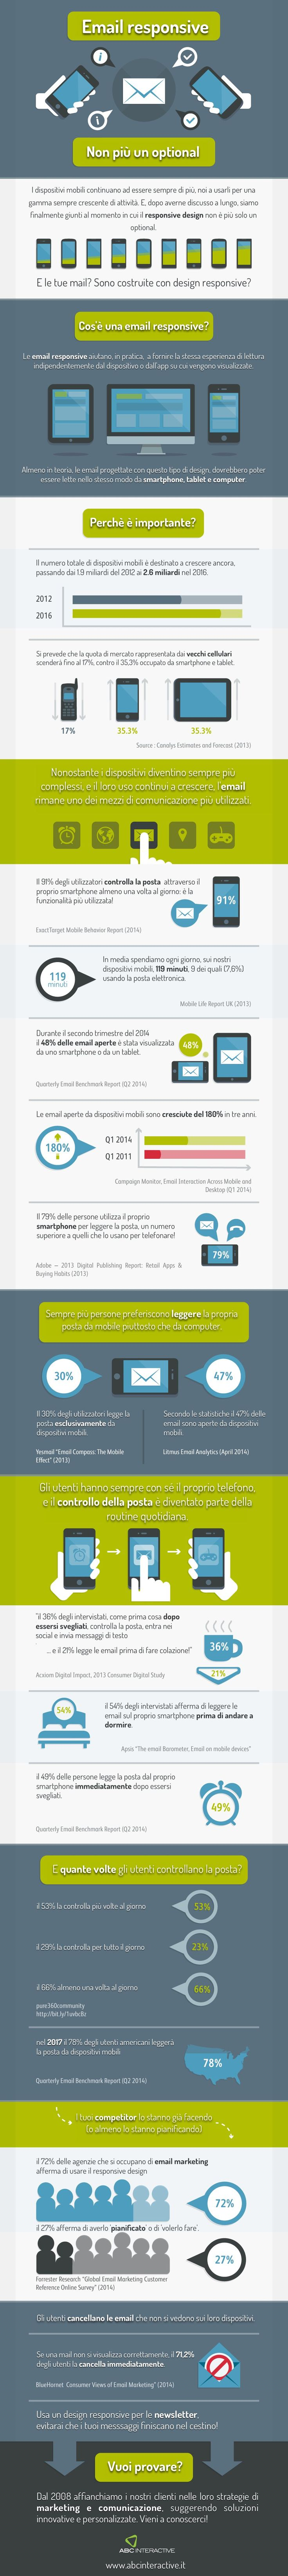 58 best responsive email design inspiration images on pinterest